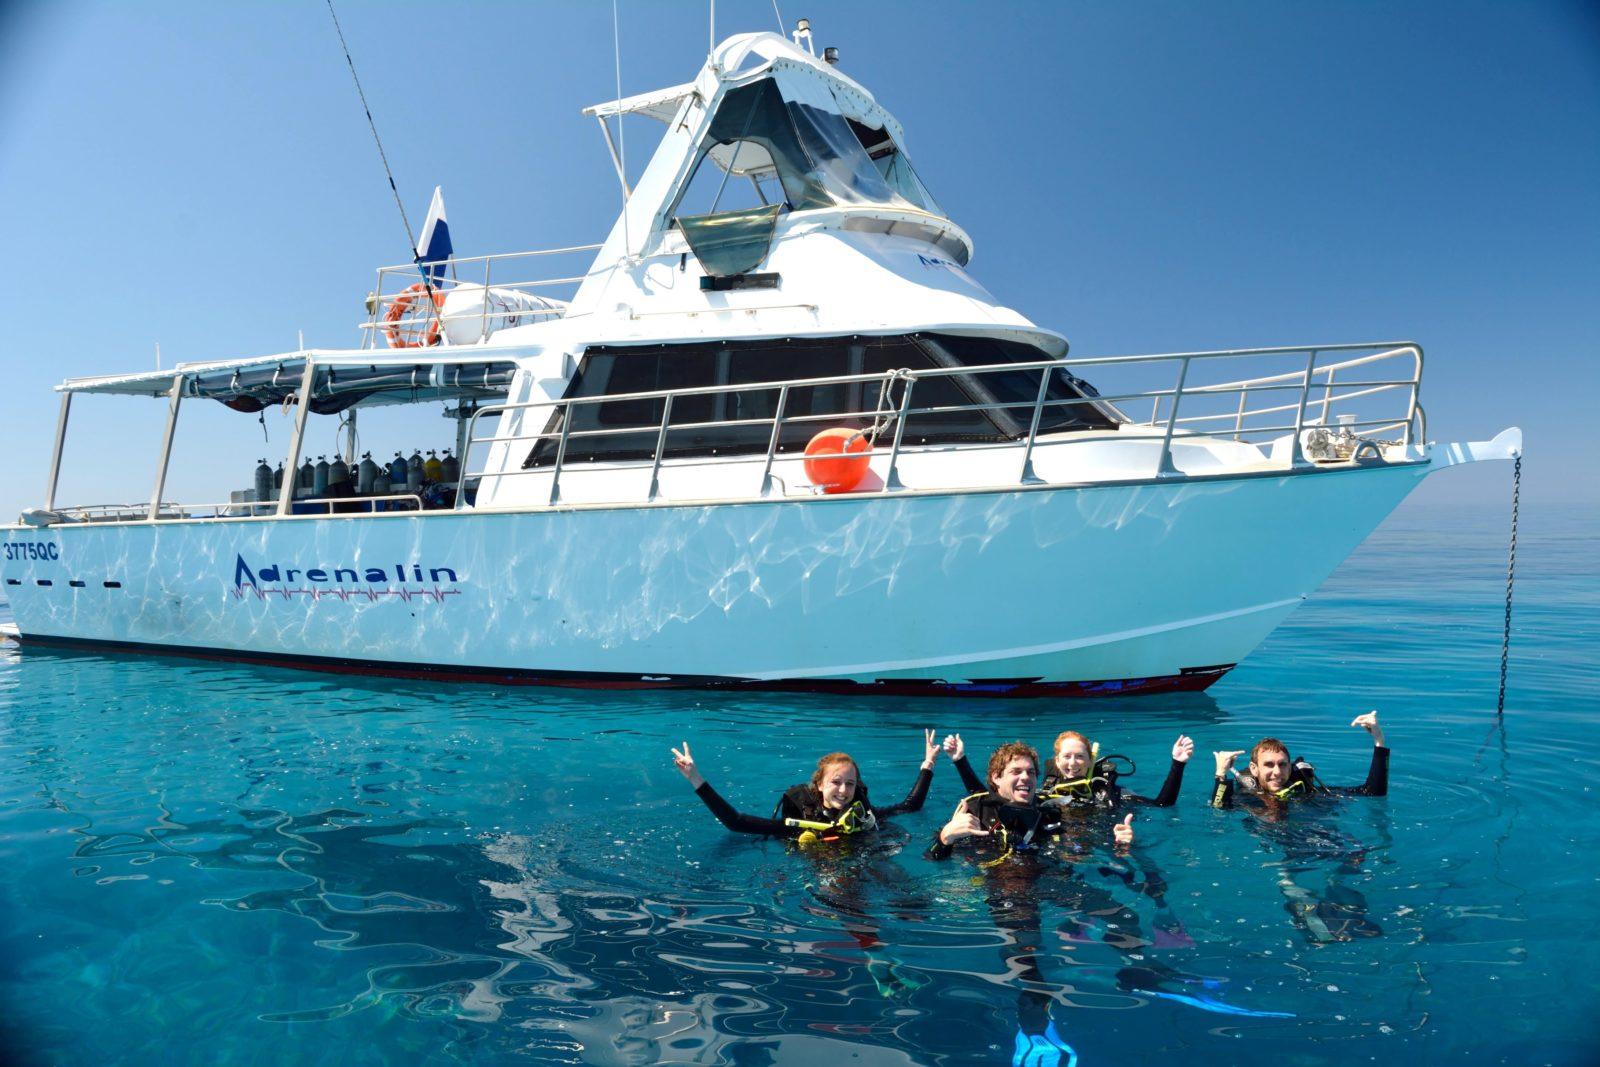 Adrenalin Snorkel and Dive